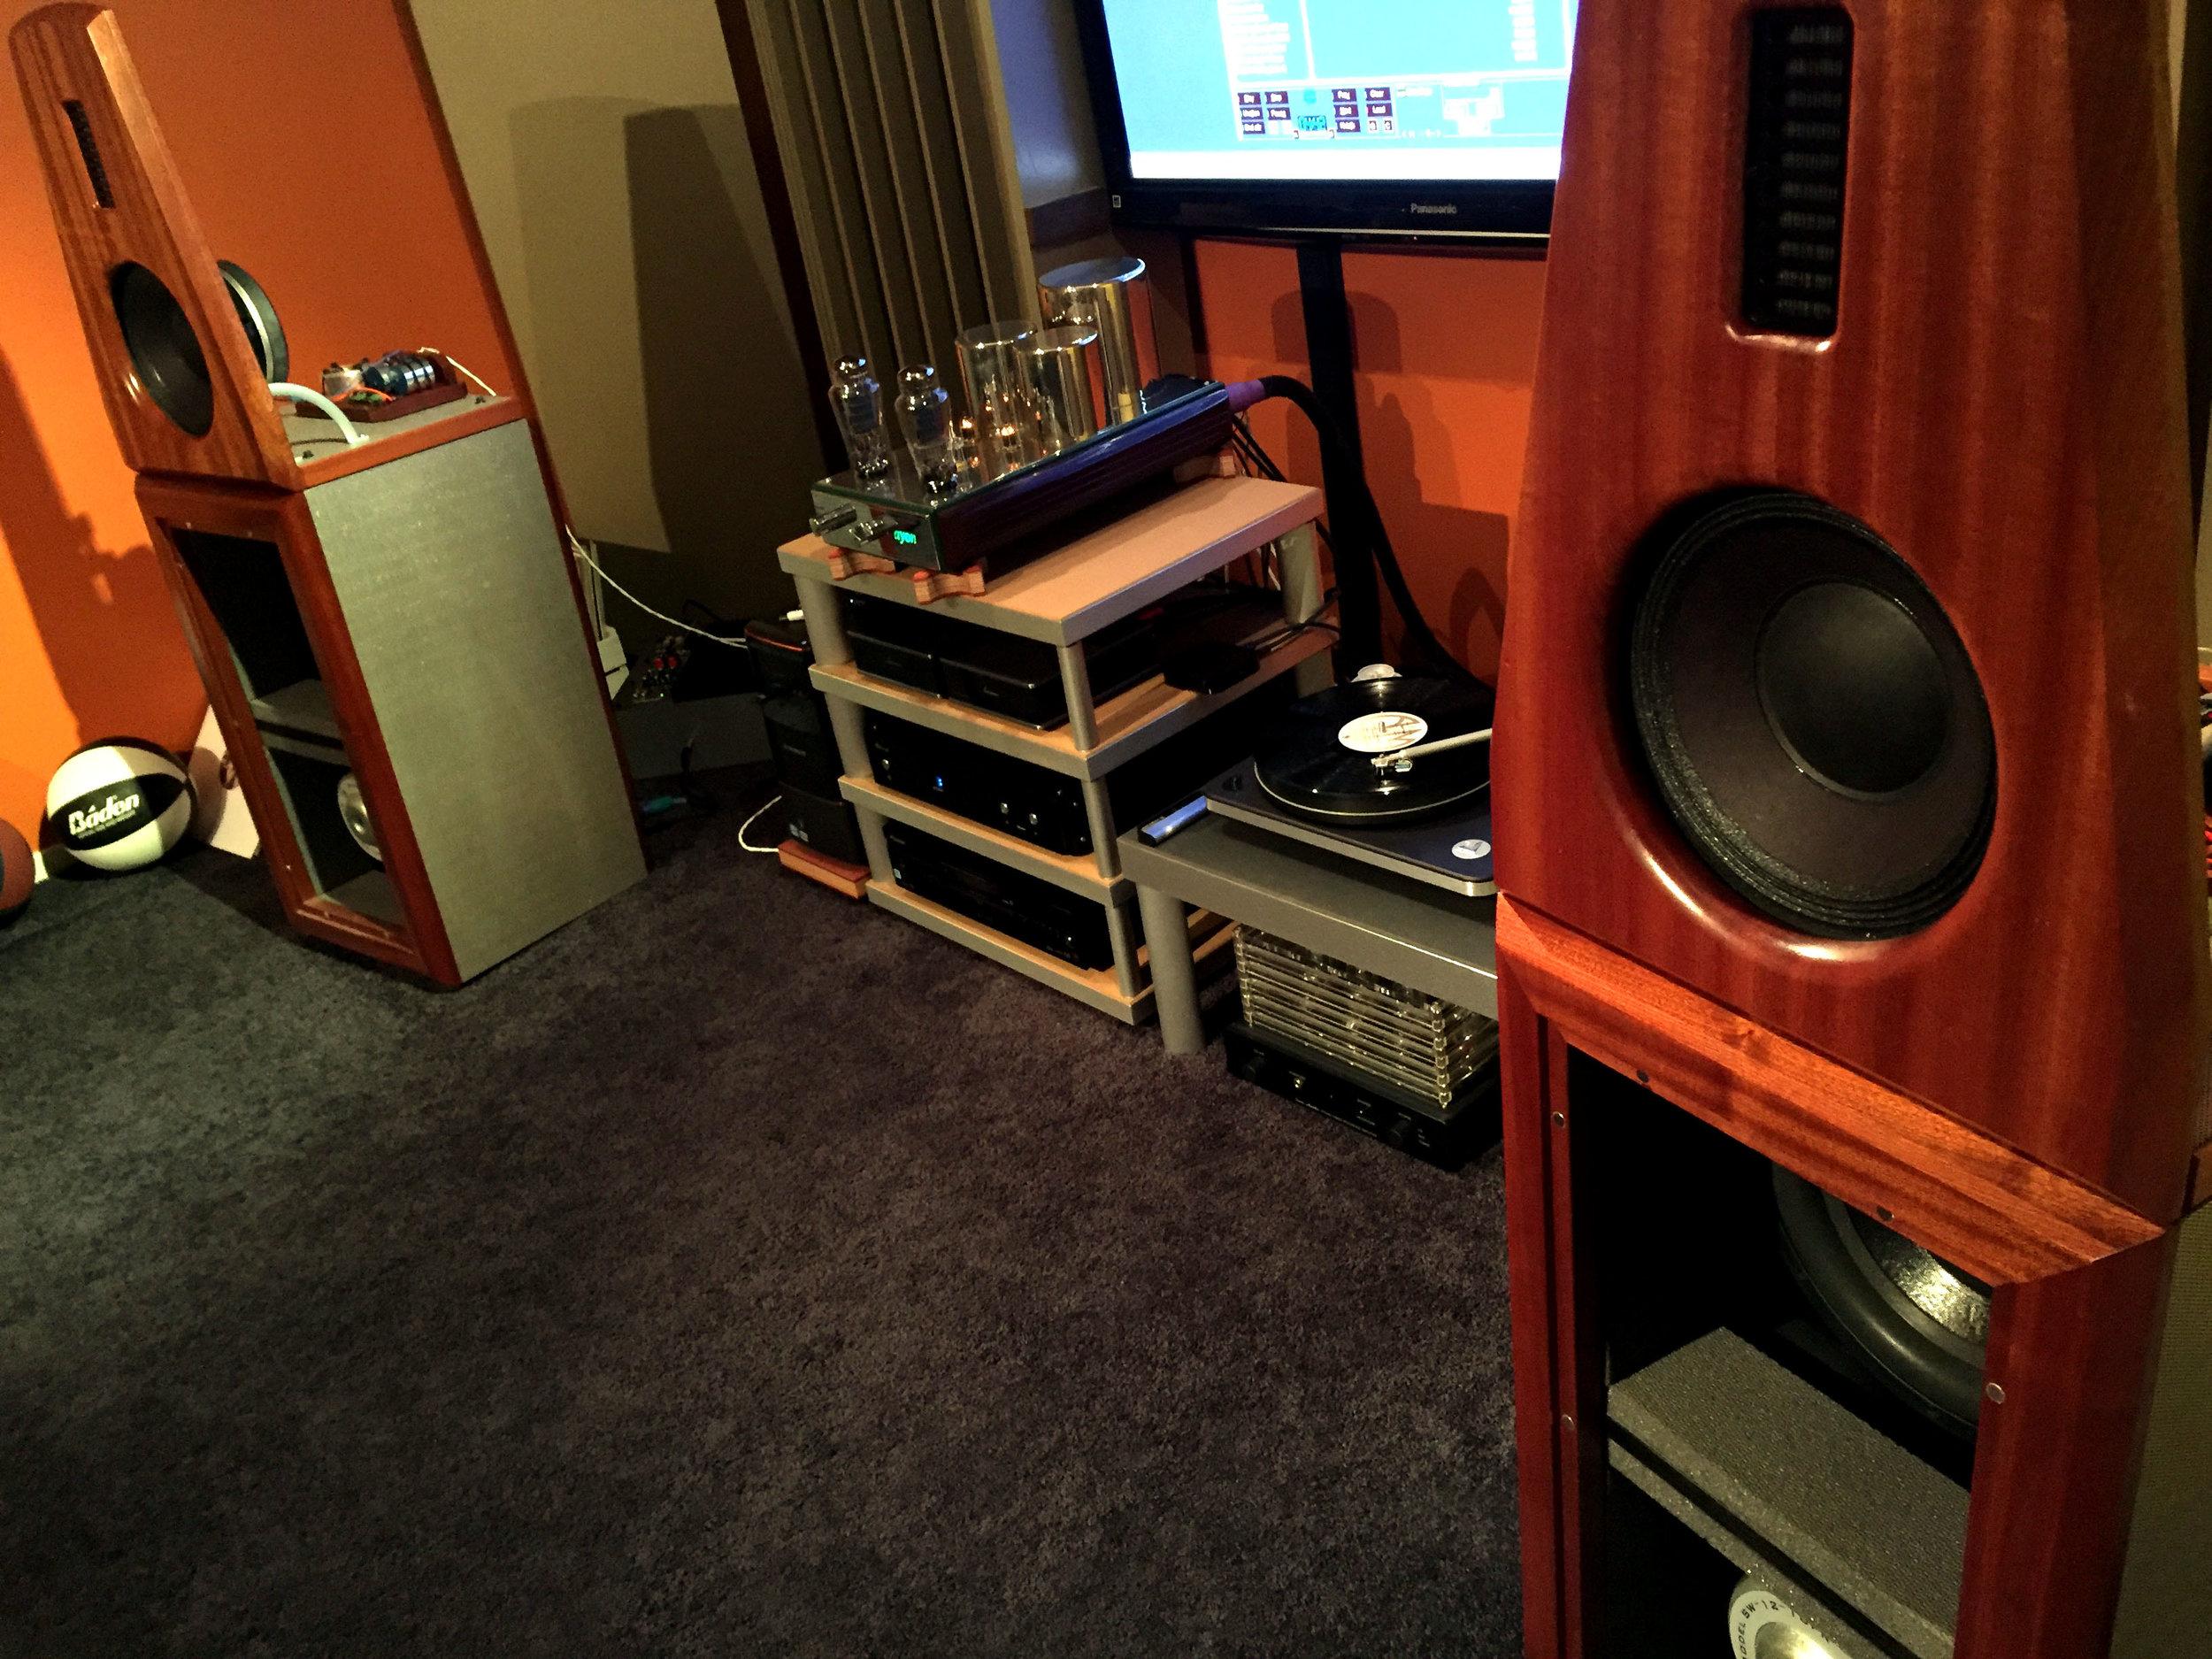 Mike Ke System : XXHighEnd, M2 Tech hiFace Evo USB to SPDIF converter, Audio GD Master 7 DAC, Ayon Sunrise integrated, Custom open baffle speakers, GR Research servo bass amps, Clearaudio Performance SEP, Denon DL-103R , Jasmine LP 2.0 S